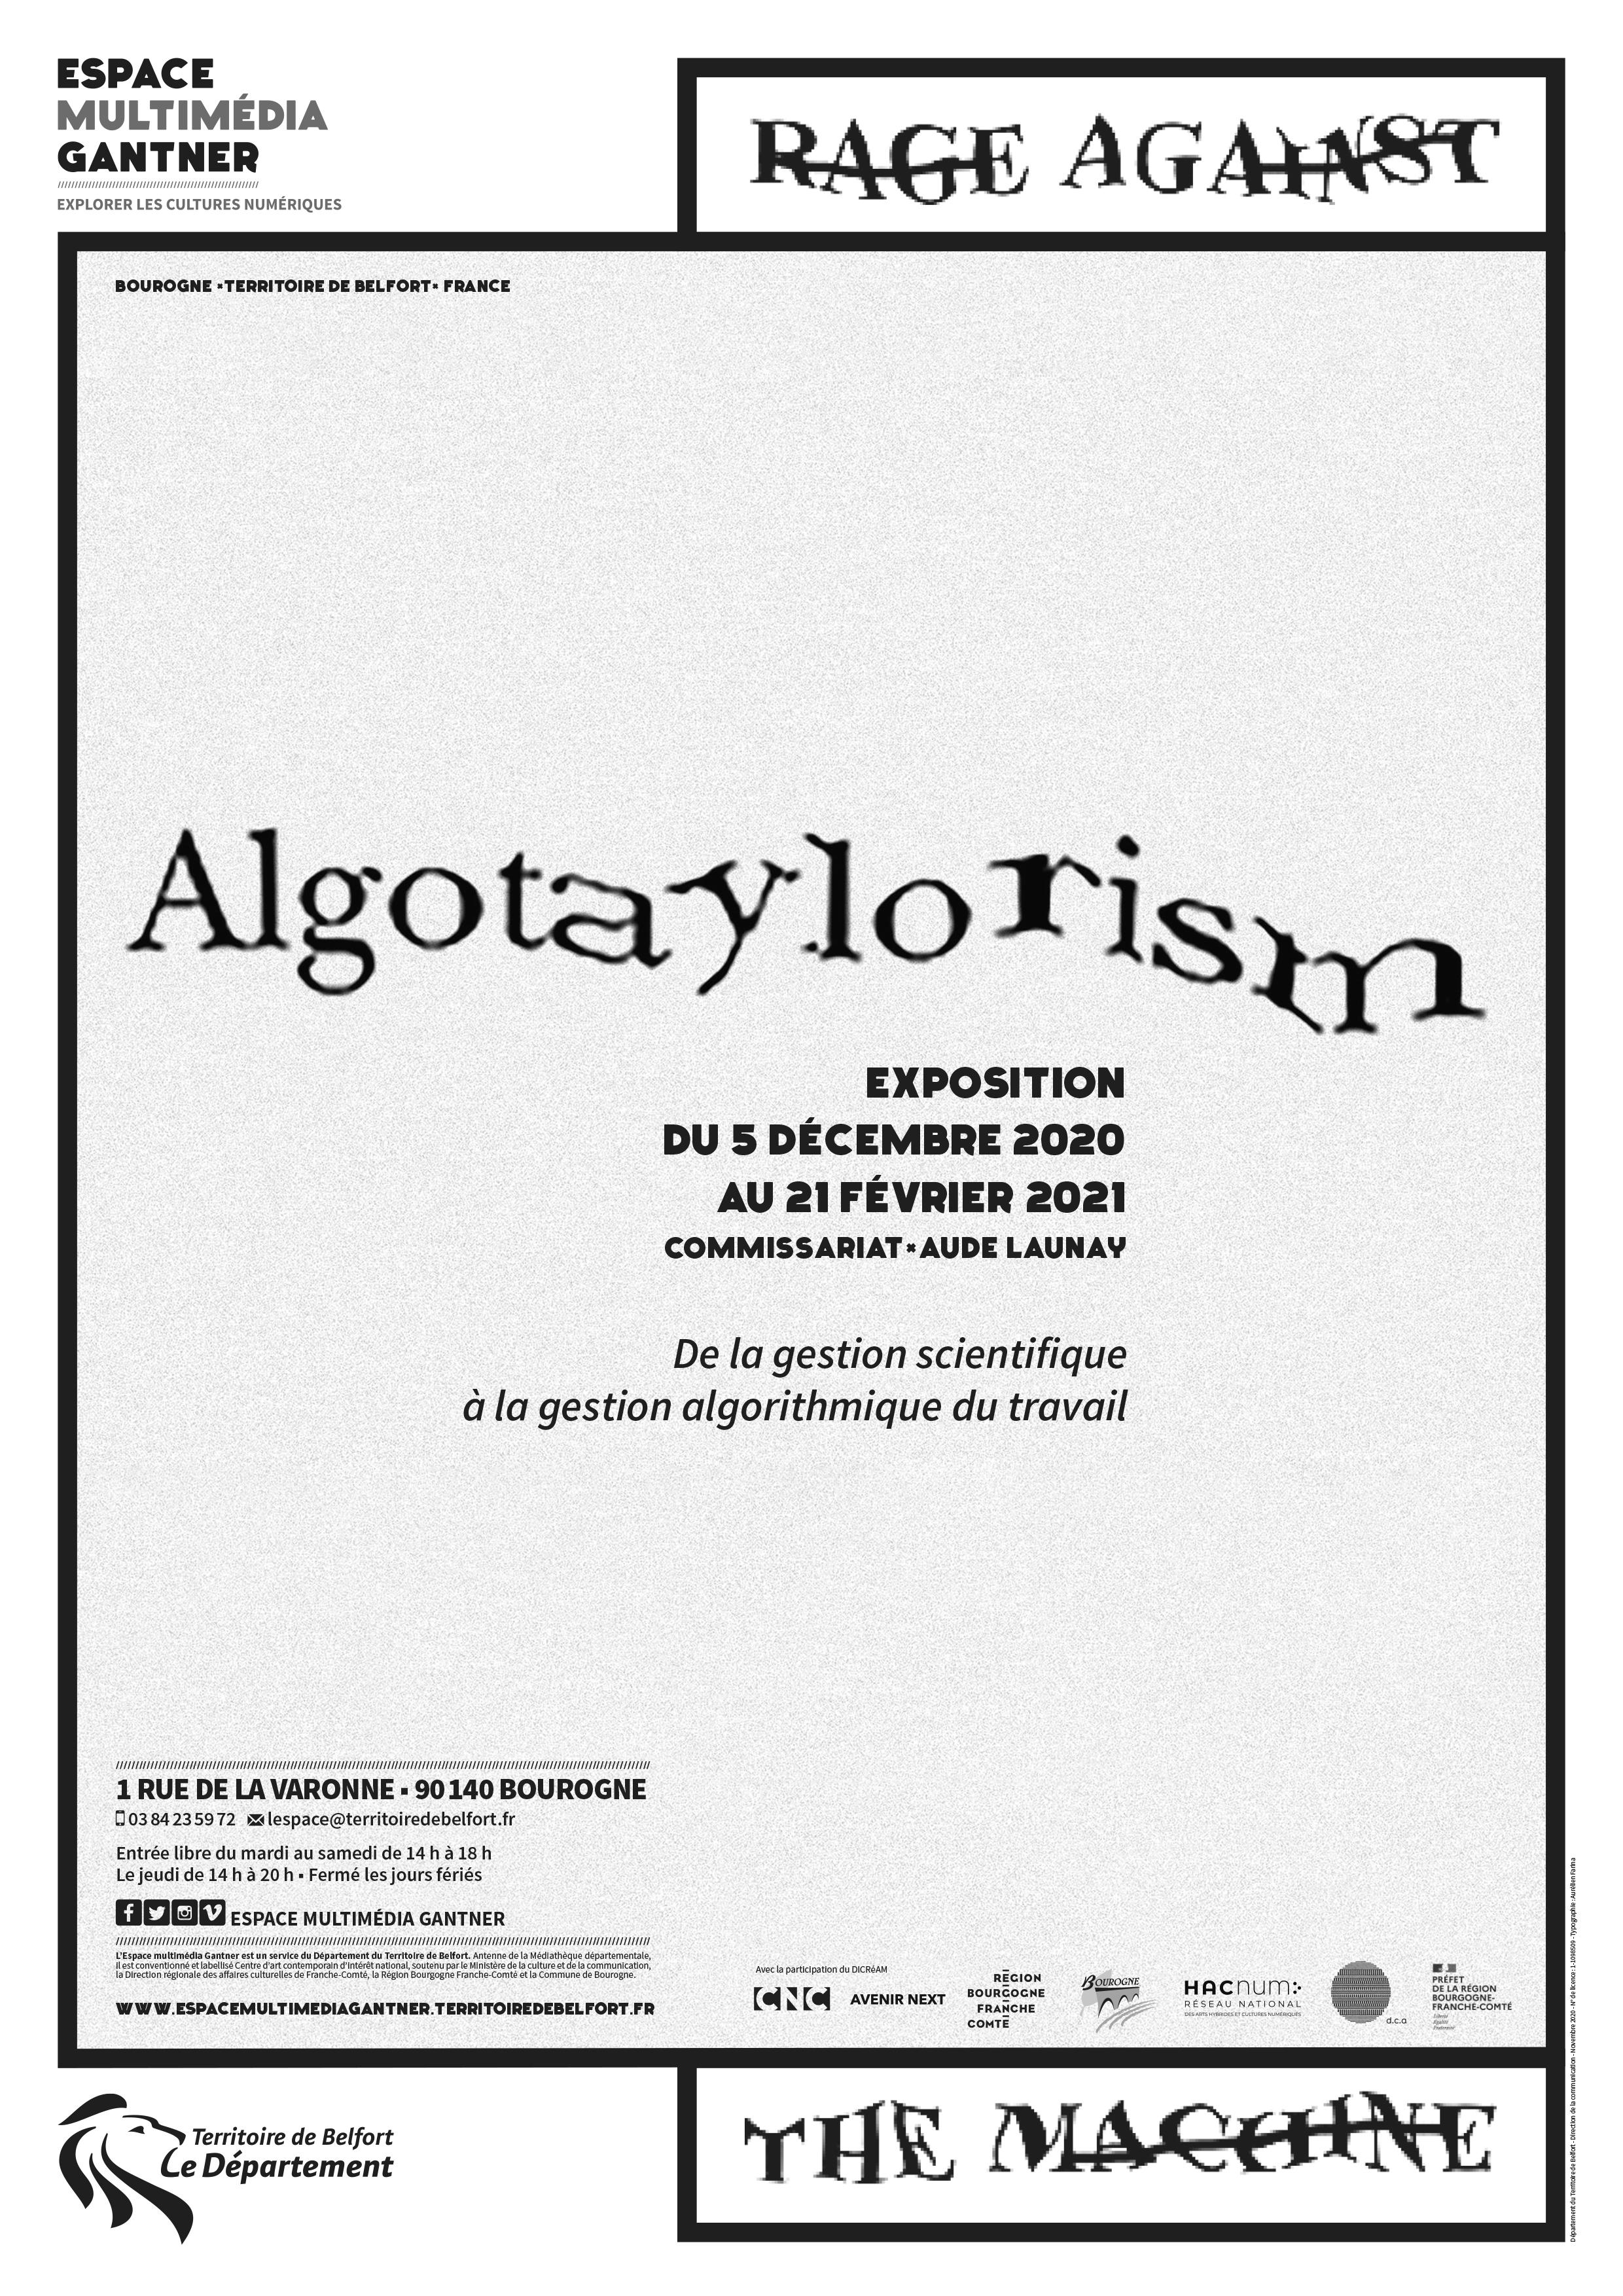 https://www.espacemultimediagantner.cg90.net/wp-content/uploads/2021/02/web-AFFICHE_EMG_ALGOTAYLORISM.jpg